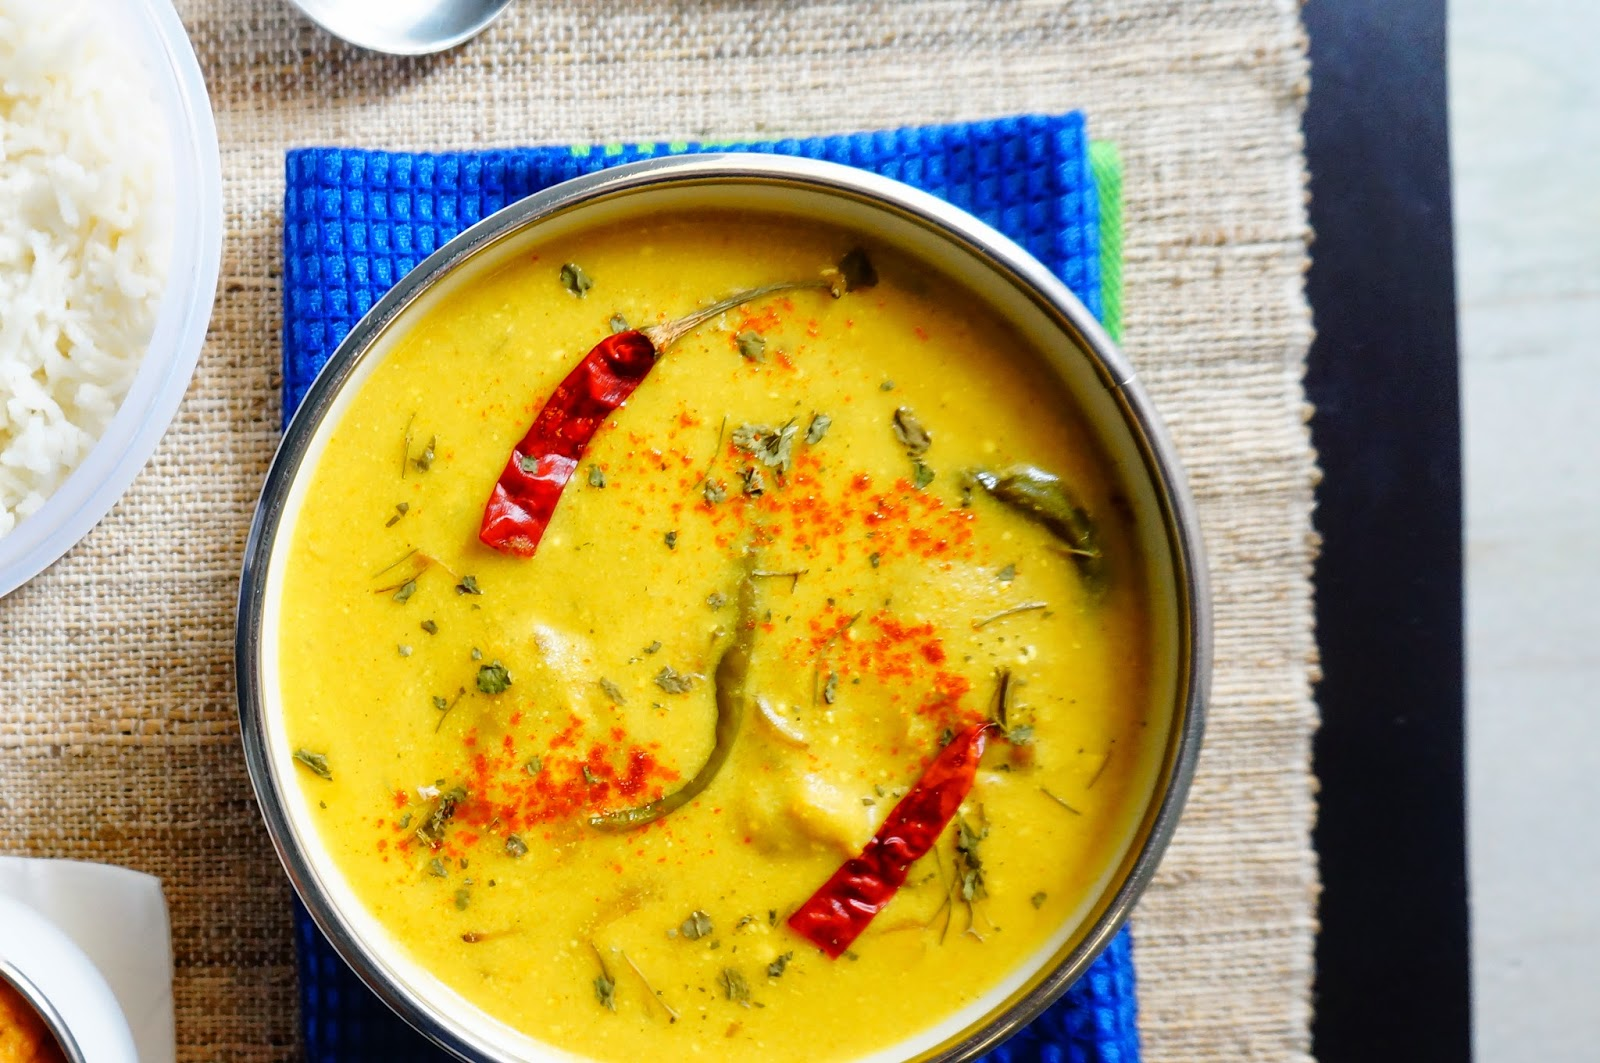 kadhi,kadhi chawal,punjabi kadhi,vegetarian,curry,indian, kadhi pakoda,gluten free